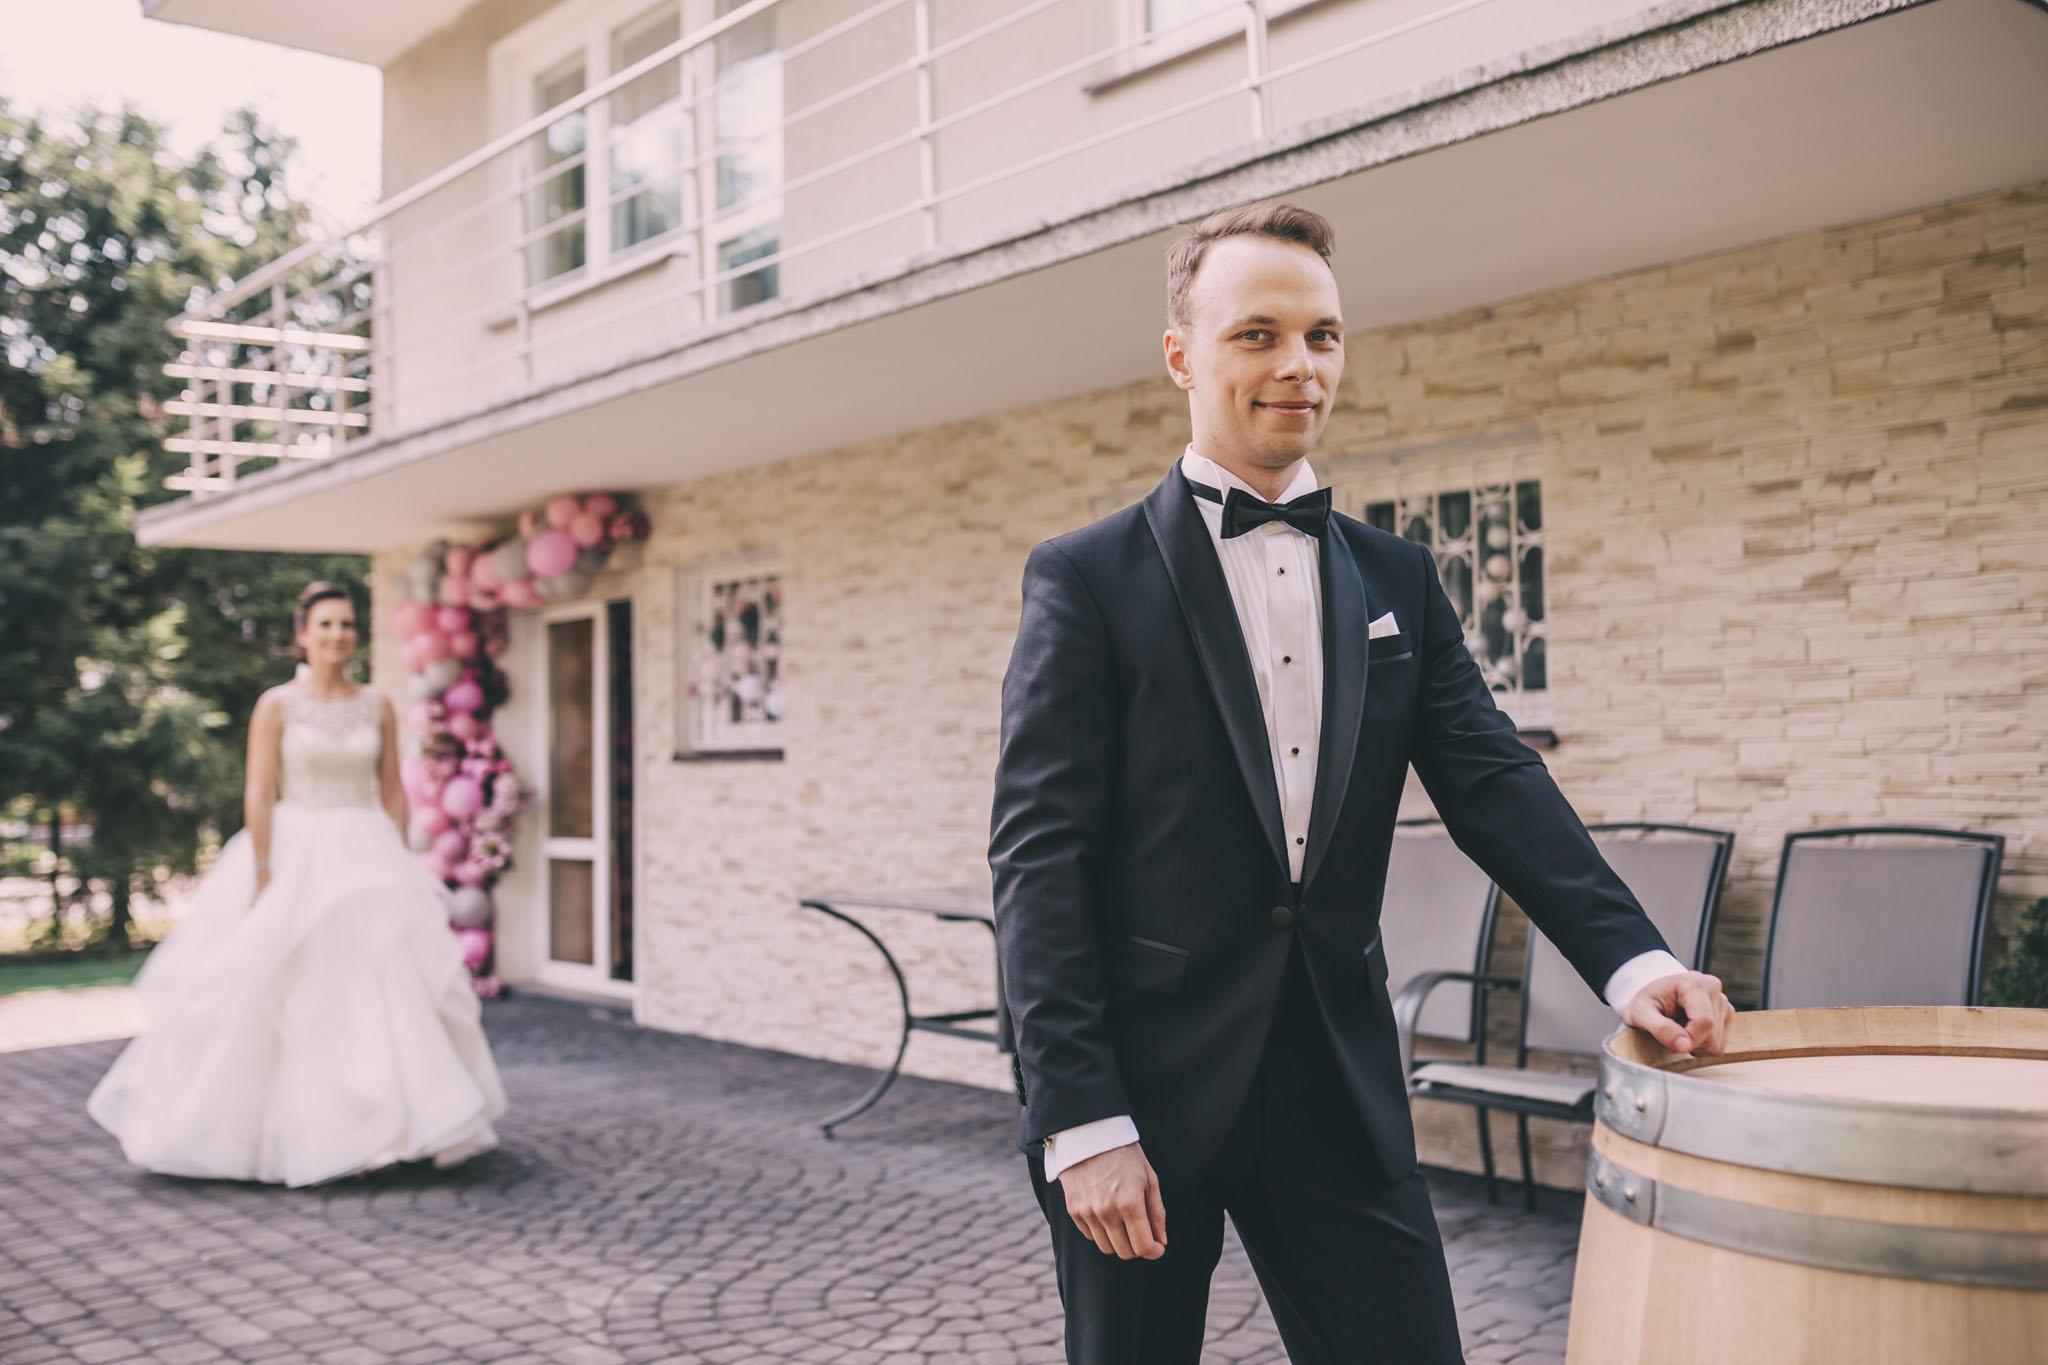 sesja first look w dniu ślubu Warszawa